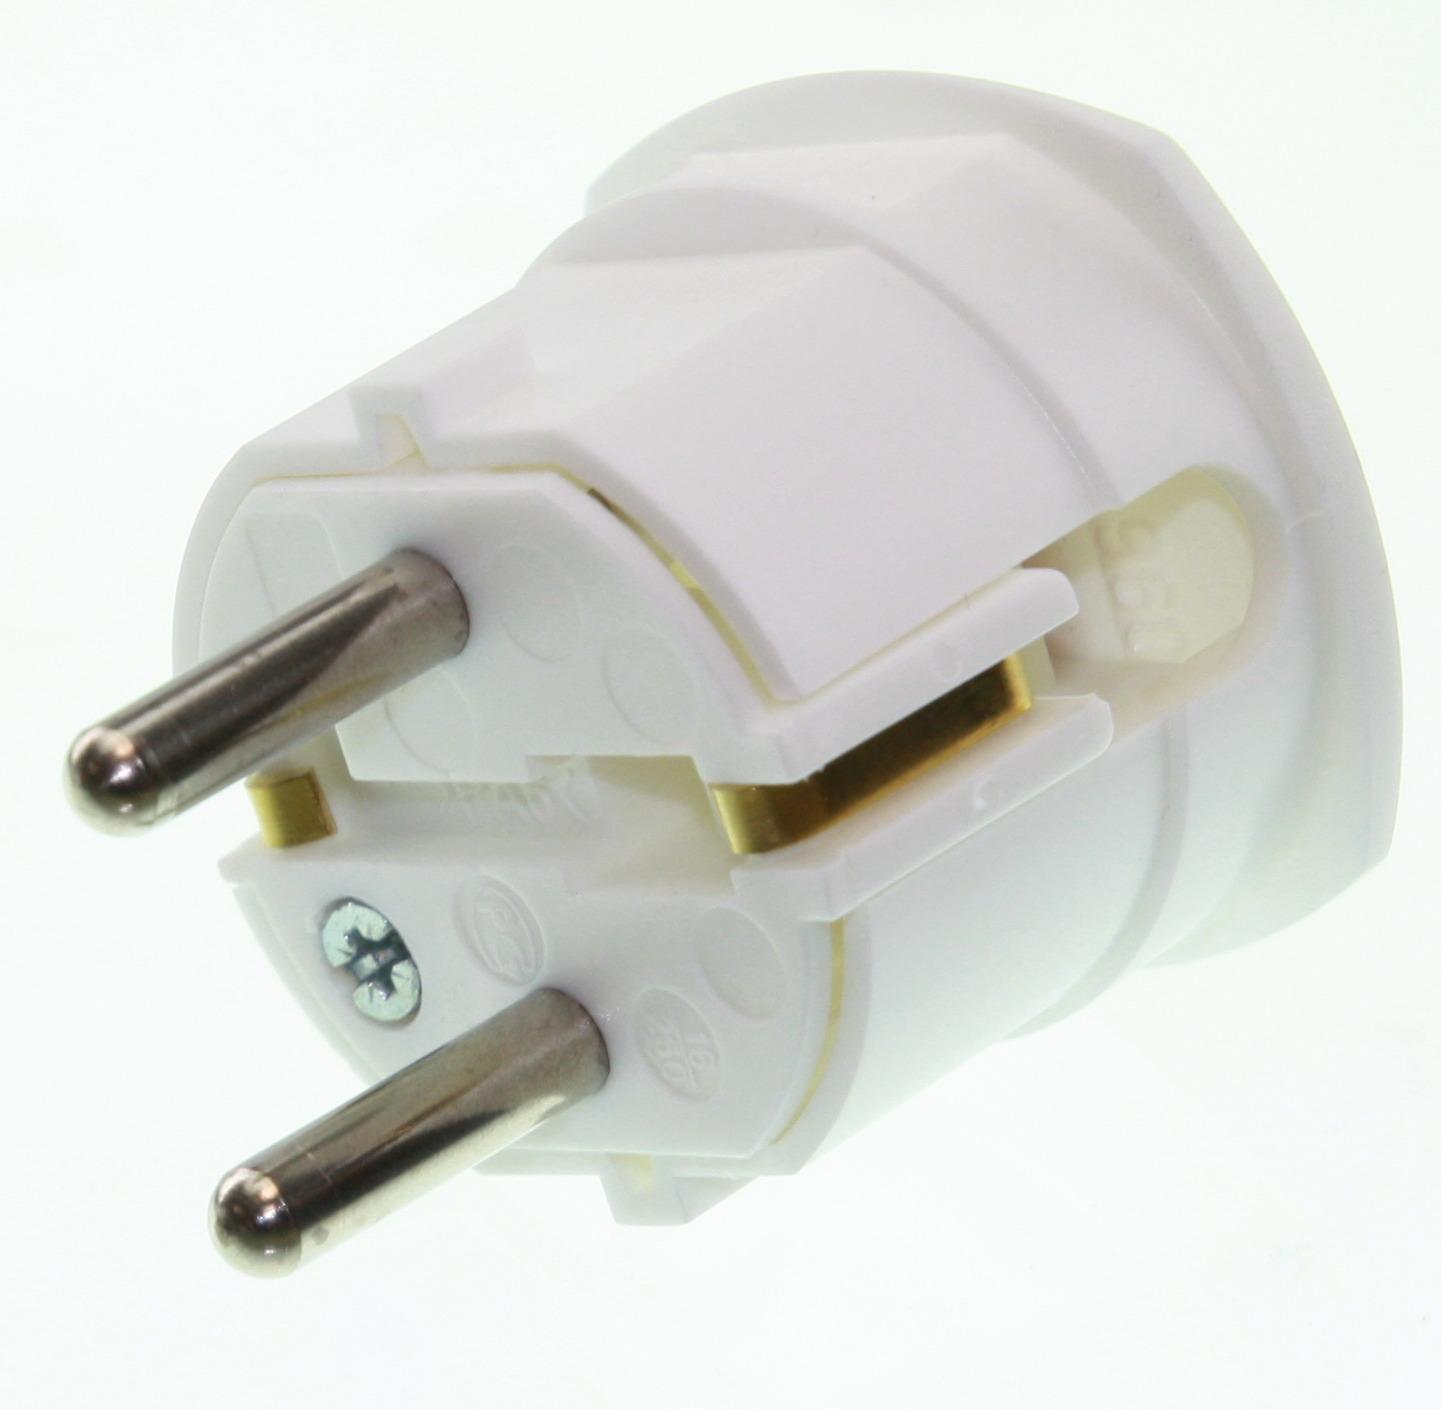 Sensationelle Schuko netstik han 230V, m. jord, hvid/ vinkel | Elektronik MG88